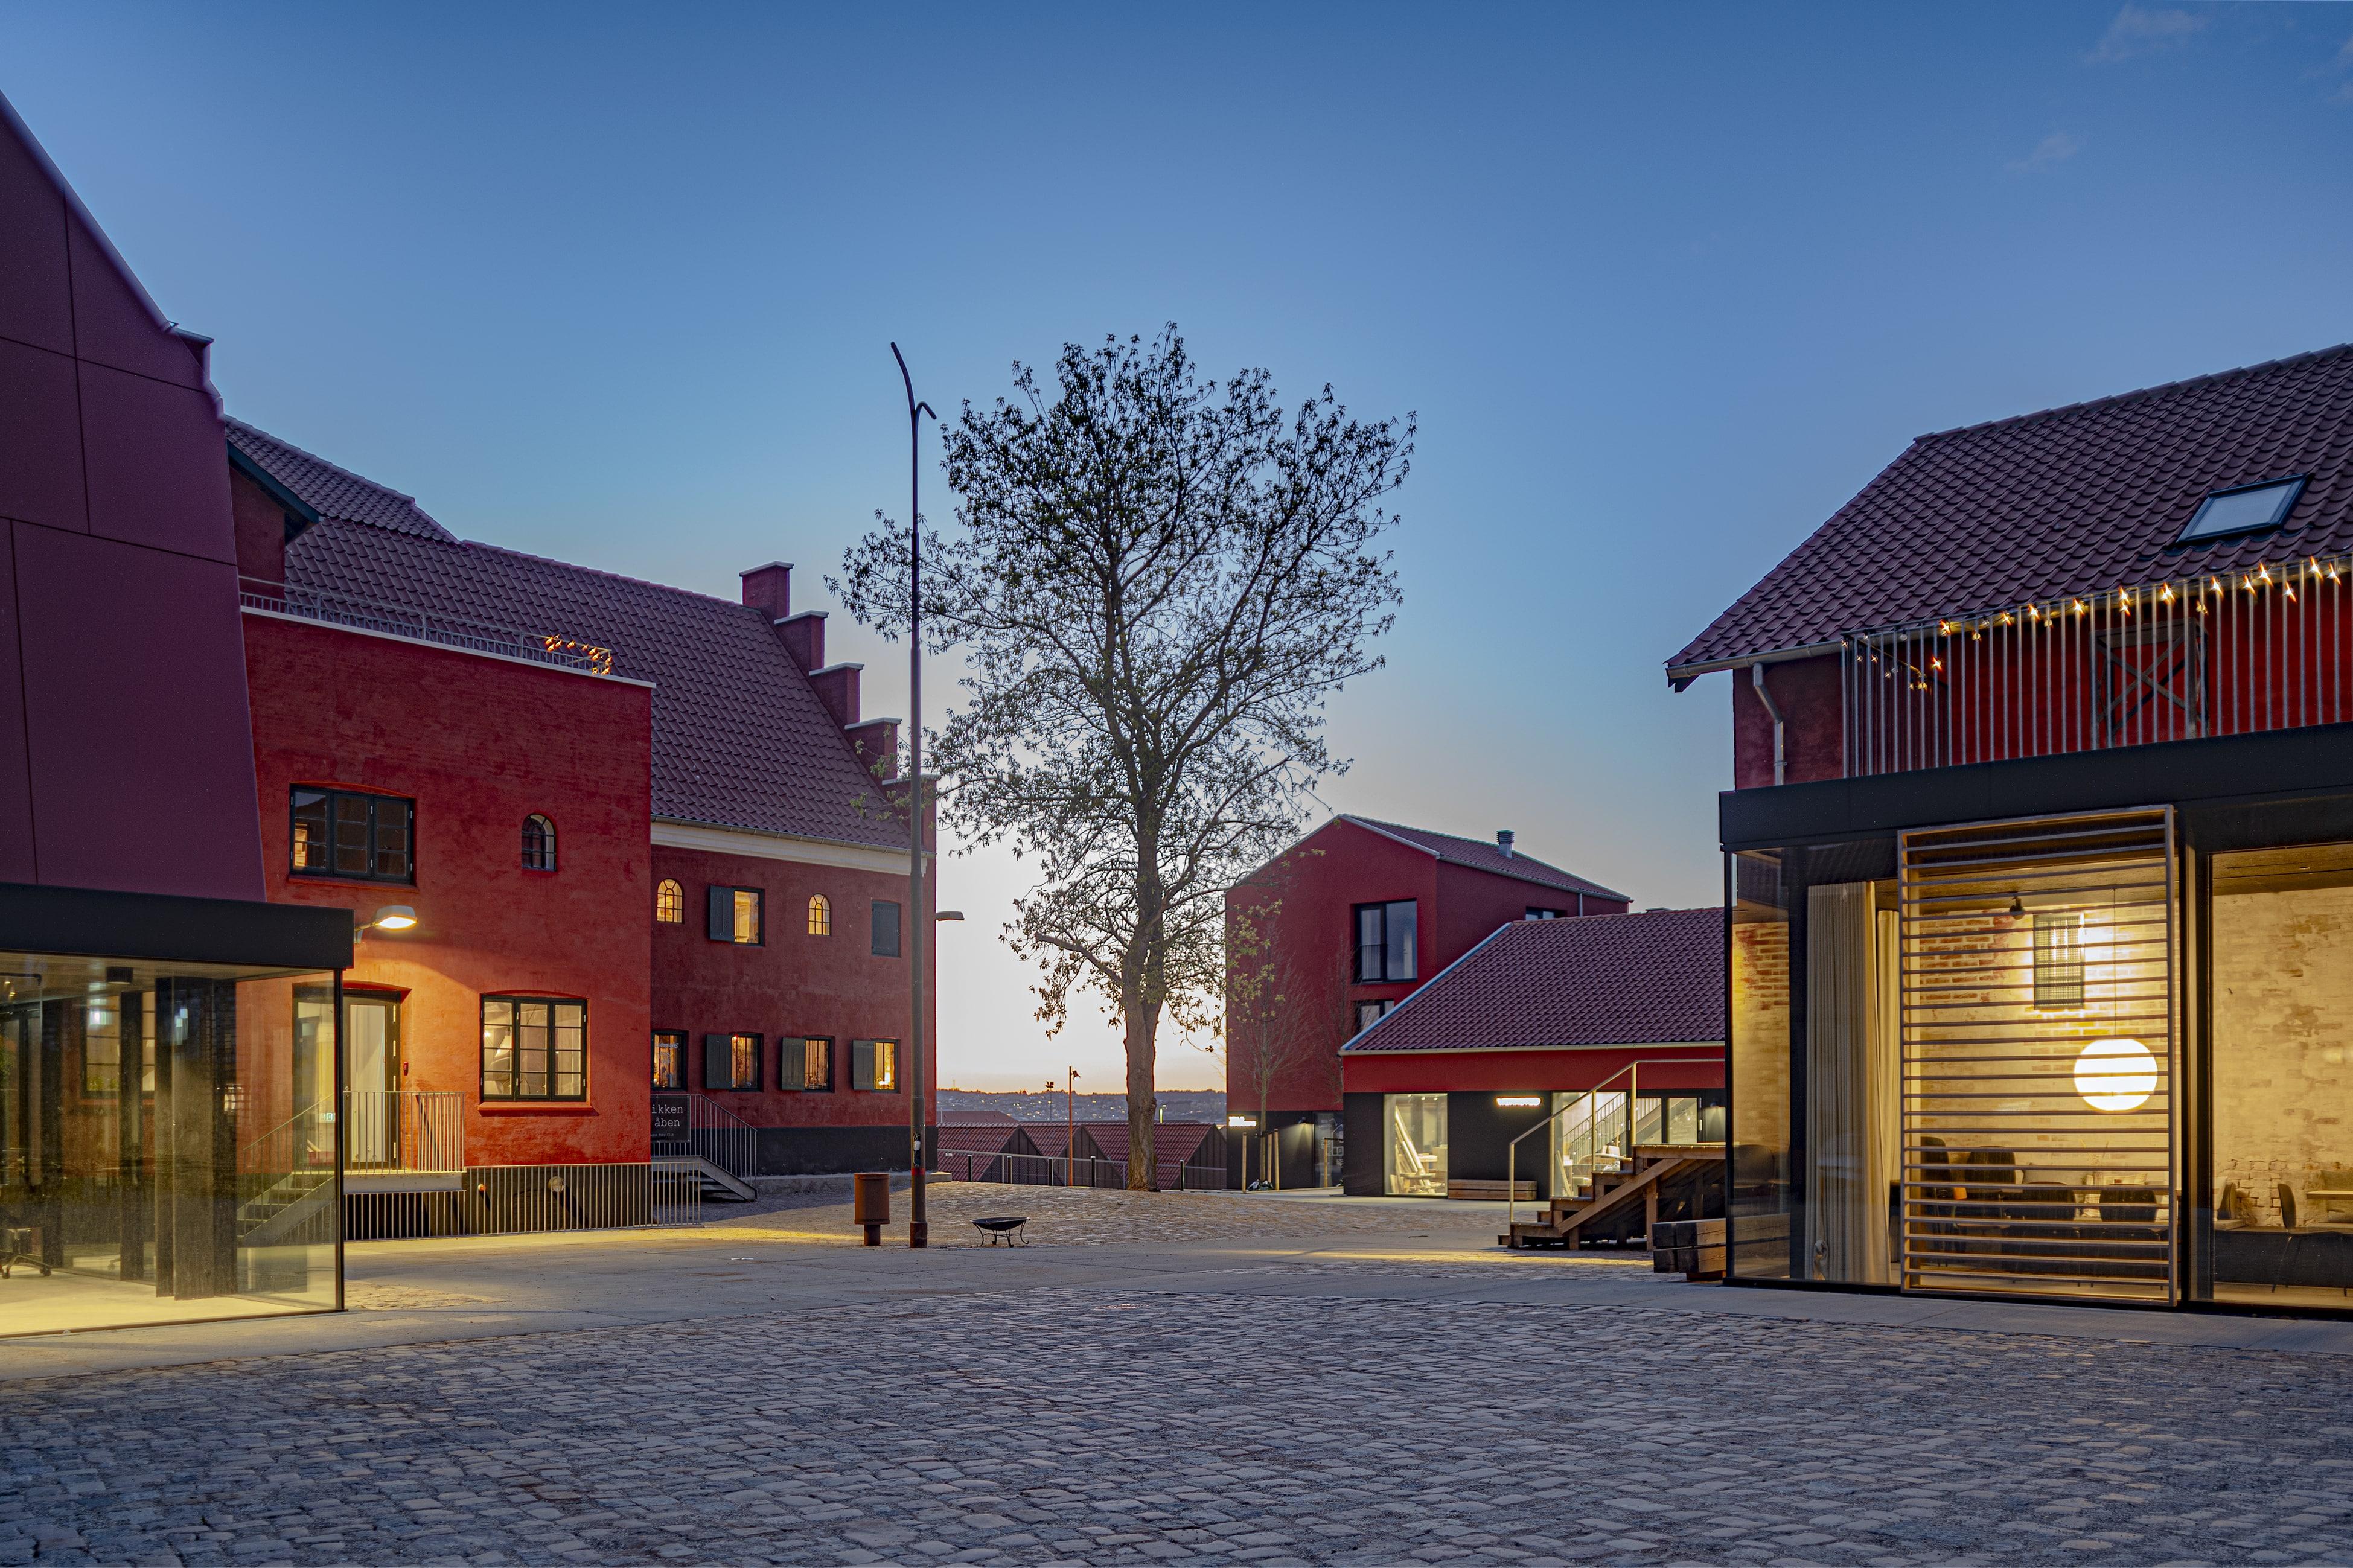 Maltfabrikken i Ebeltoft (Foto: Maltfabrikken/Jens Lindhe)